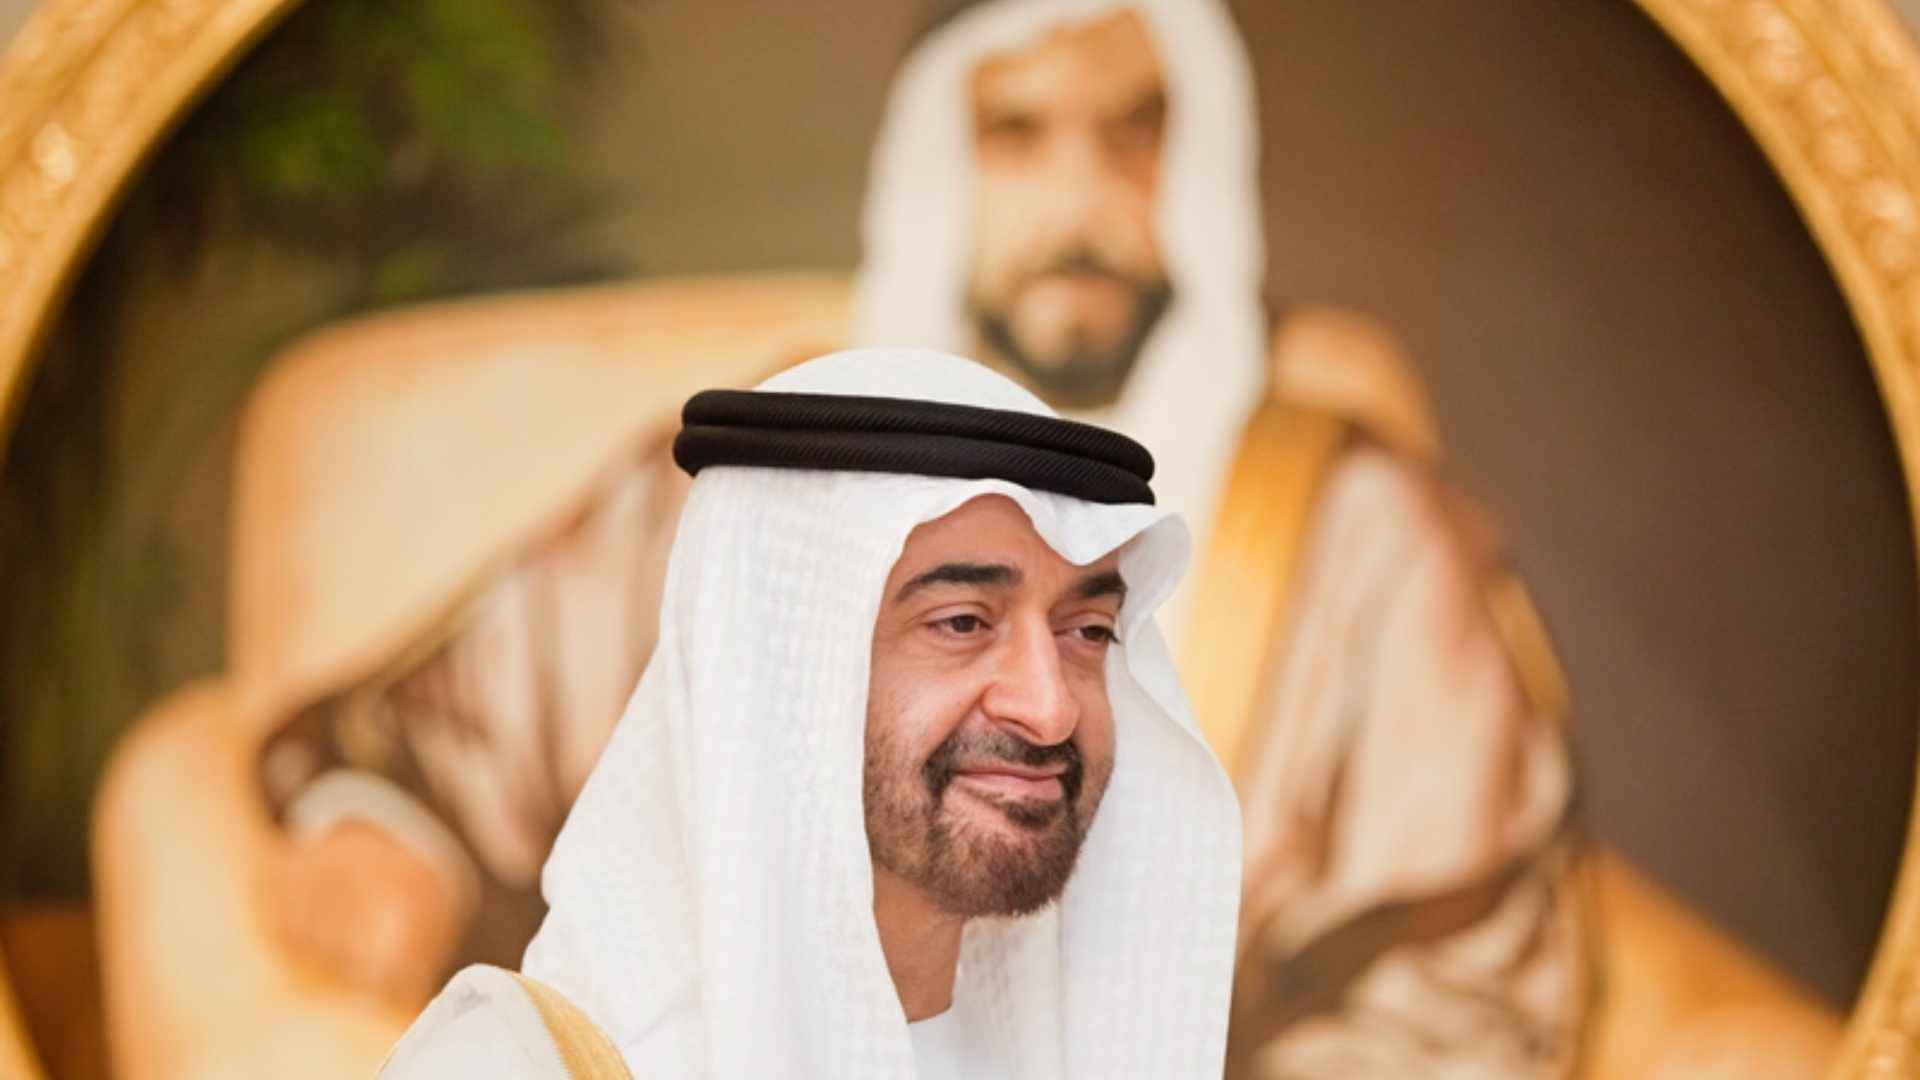 abu-dhabi crown prince oil control